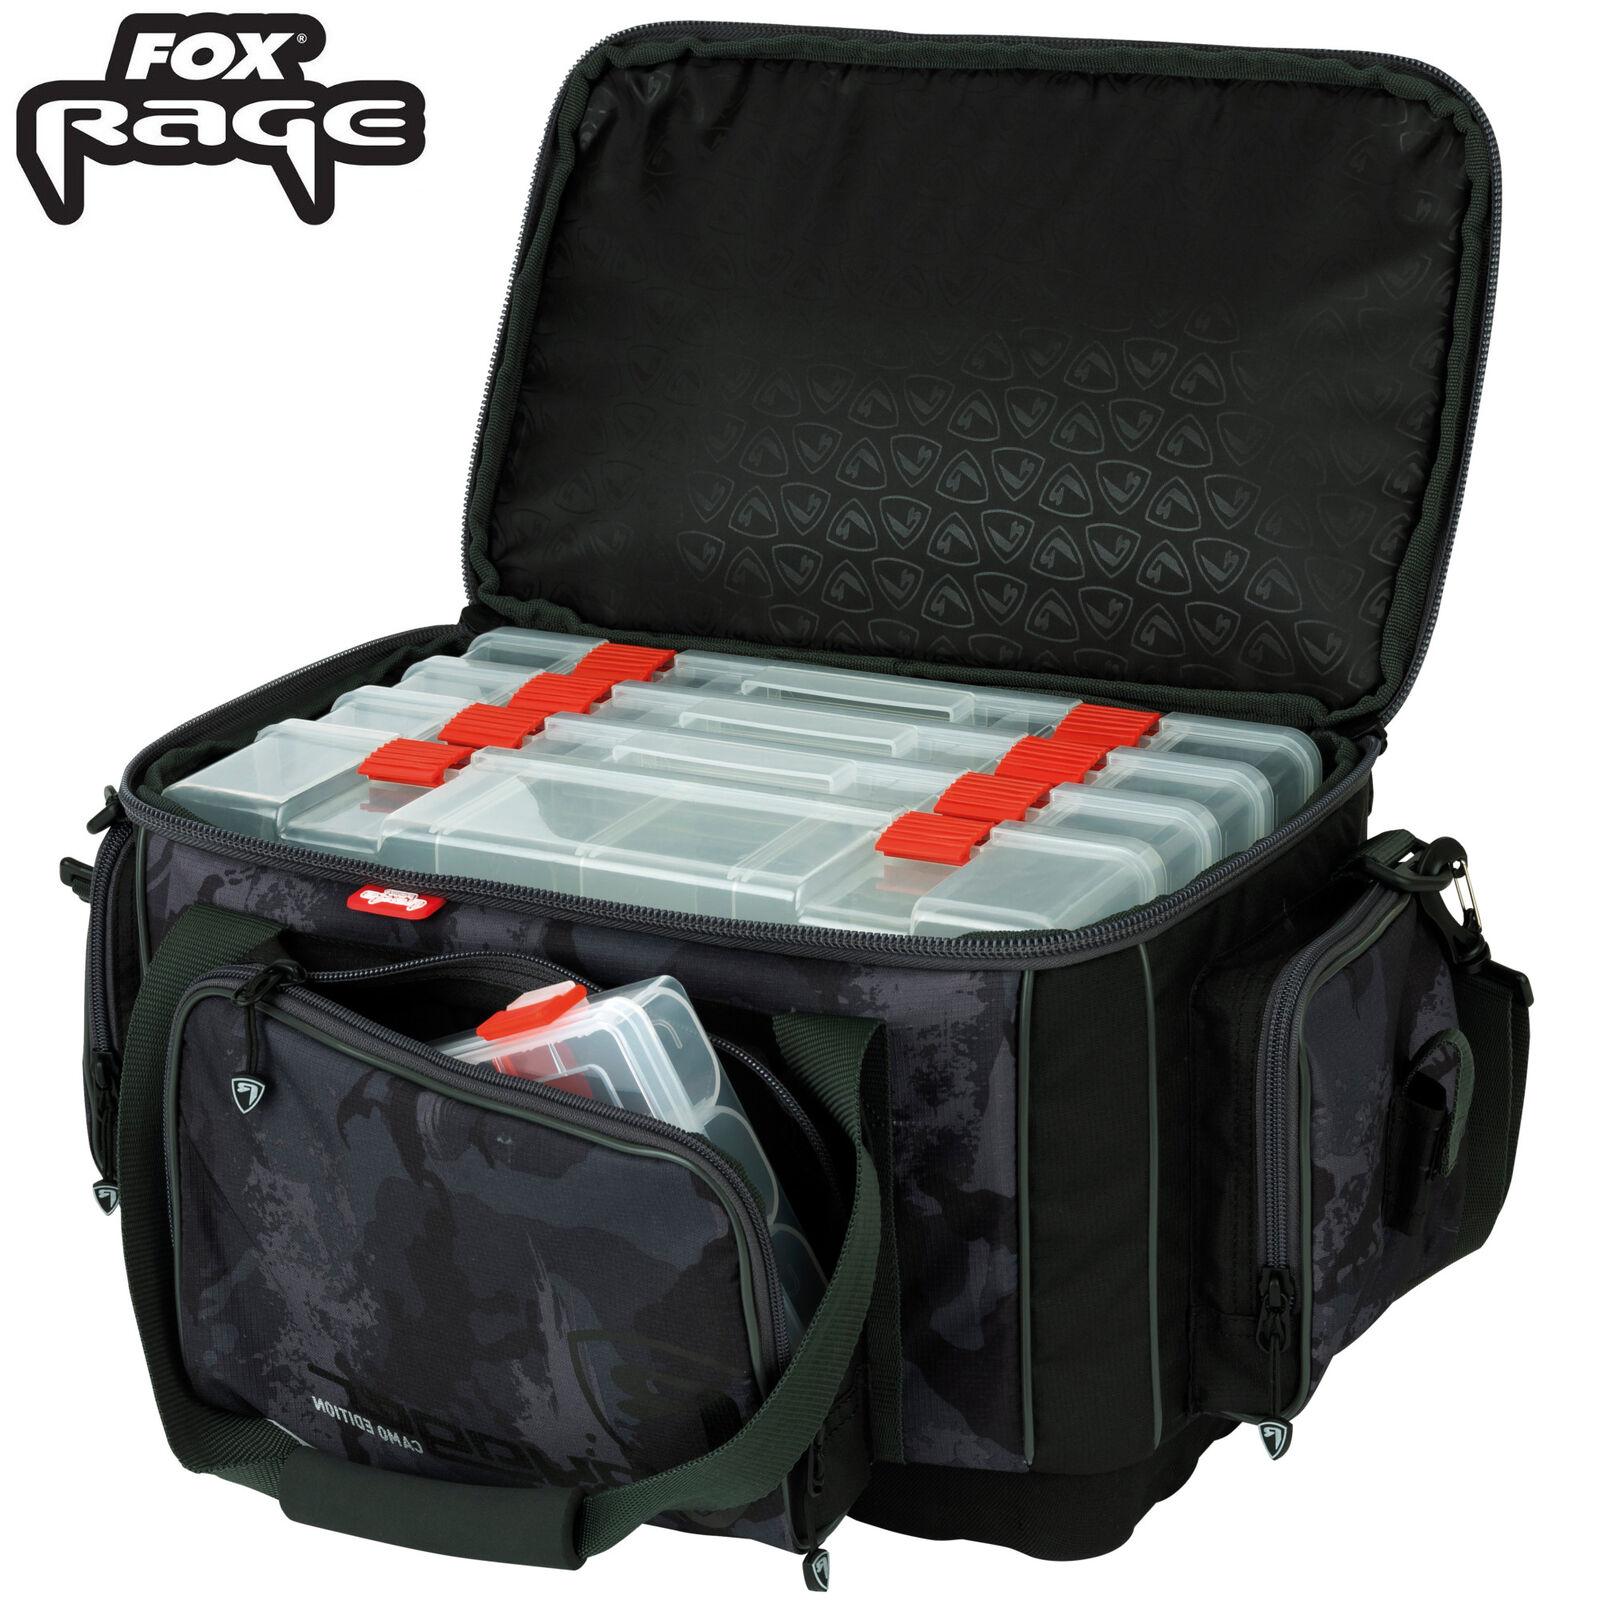 Fox Rage Camo Large Carrybag - Kunstködertasche, Spinntasche, Raubfischtasche